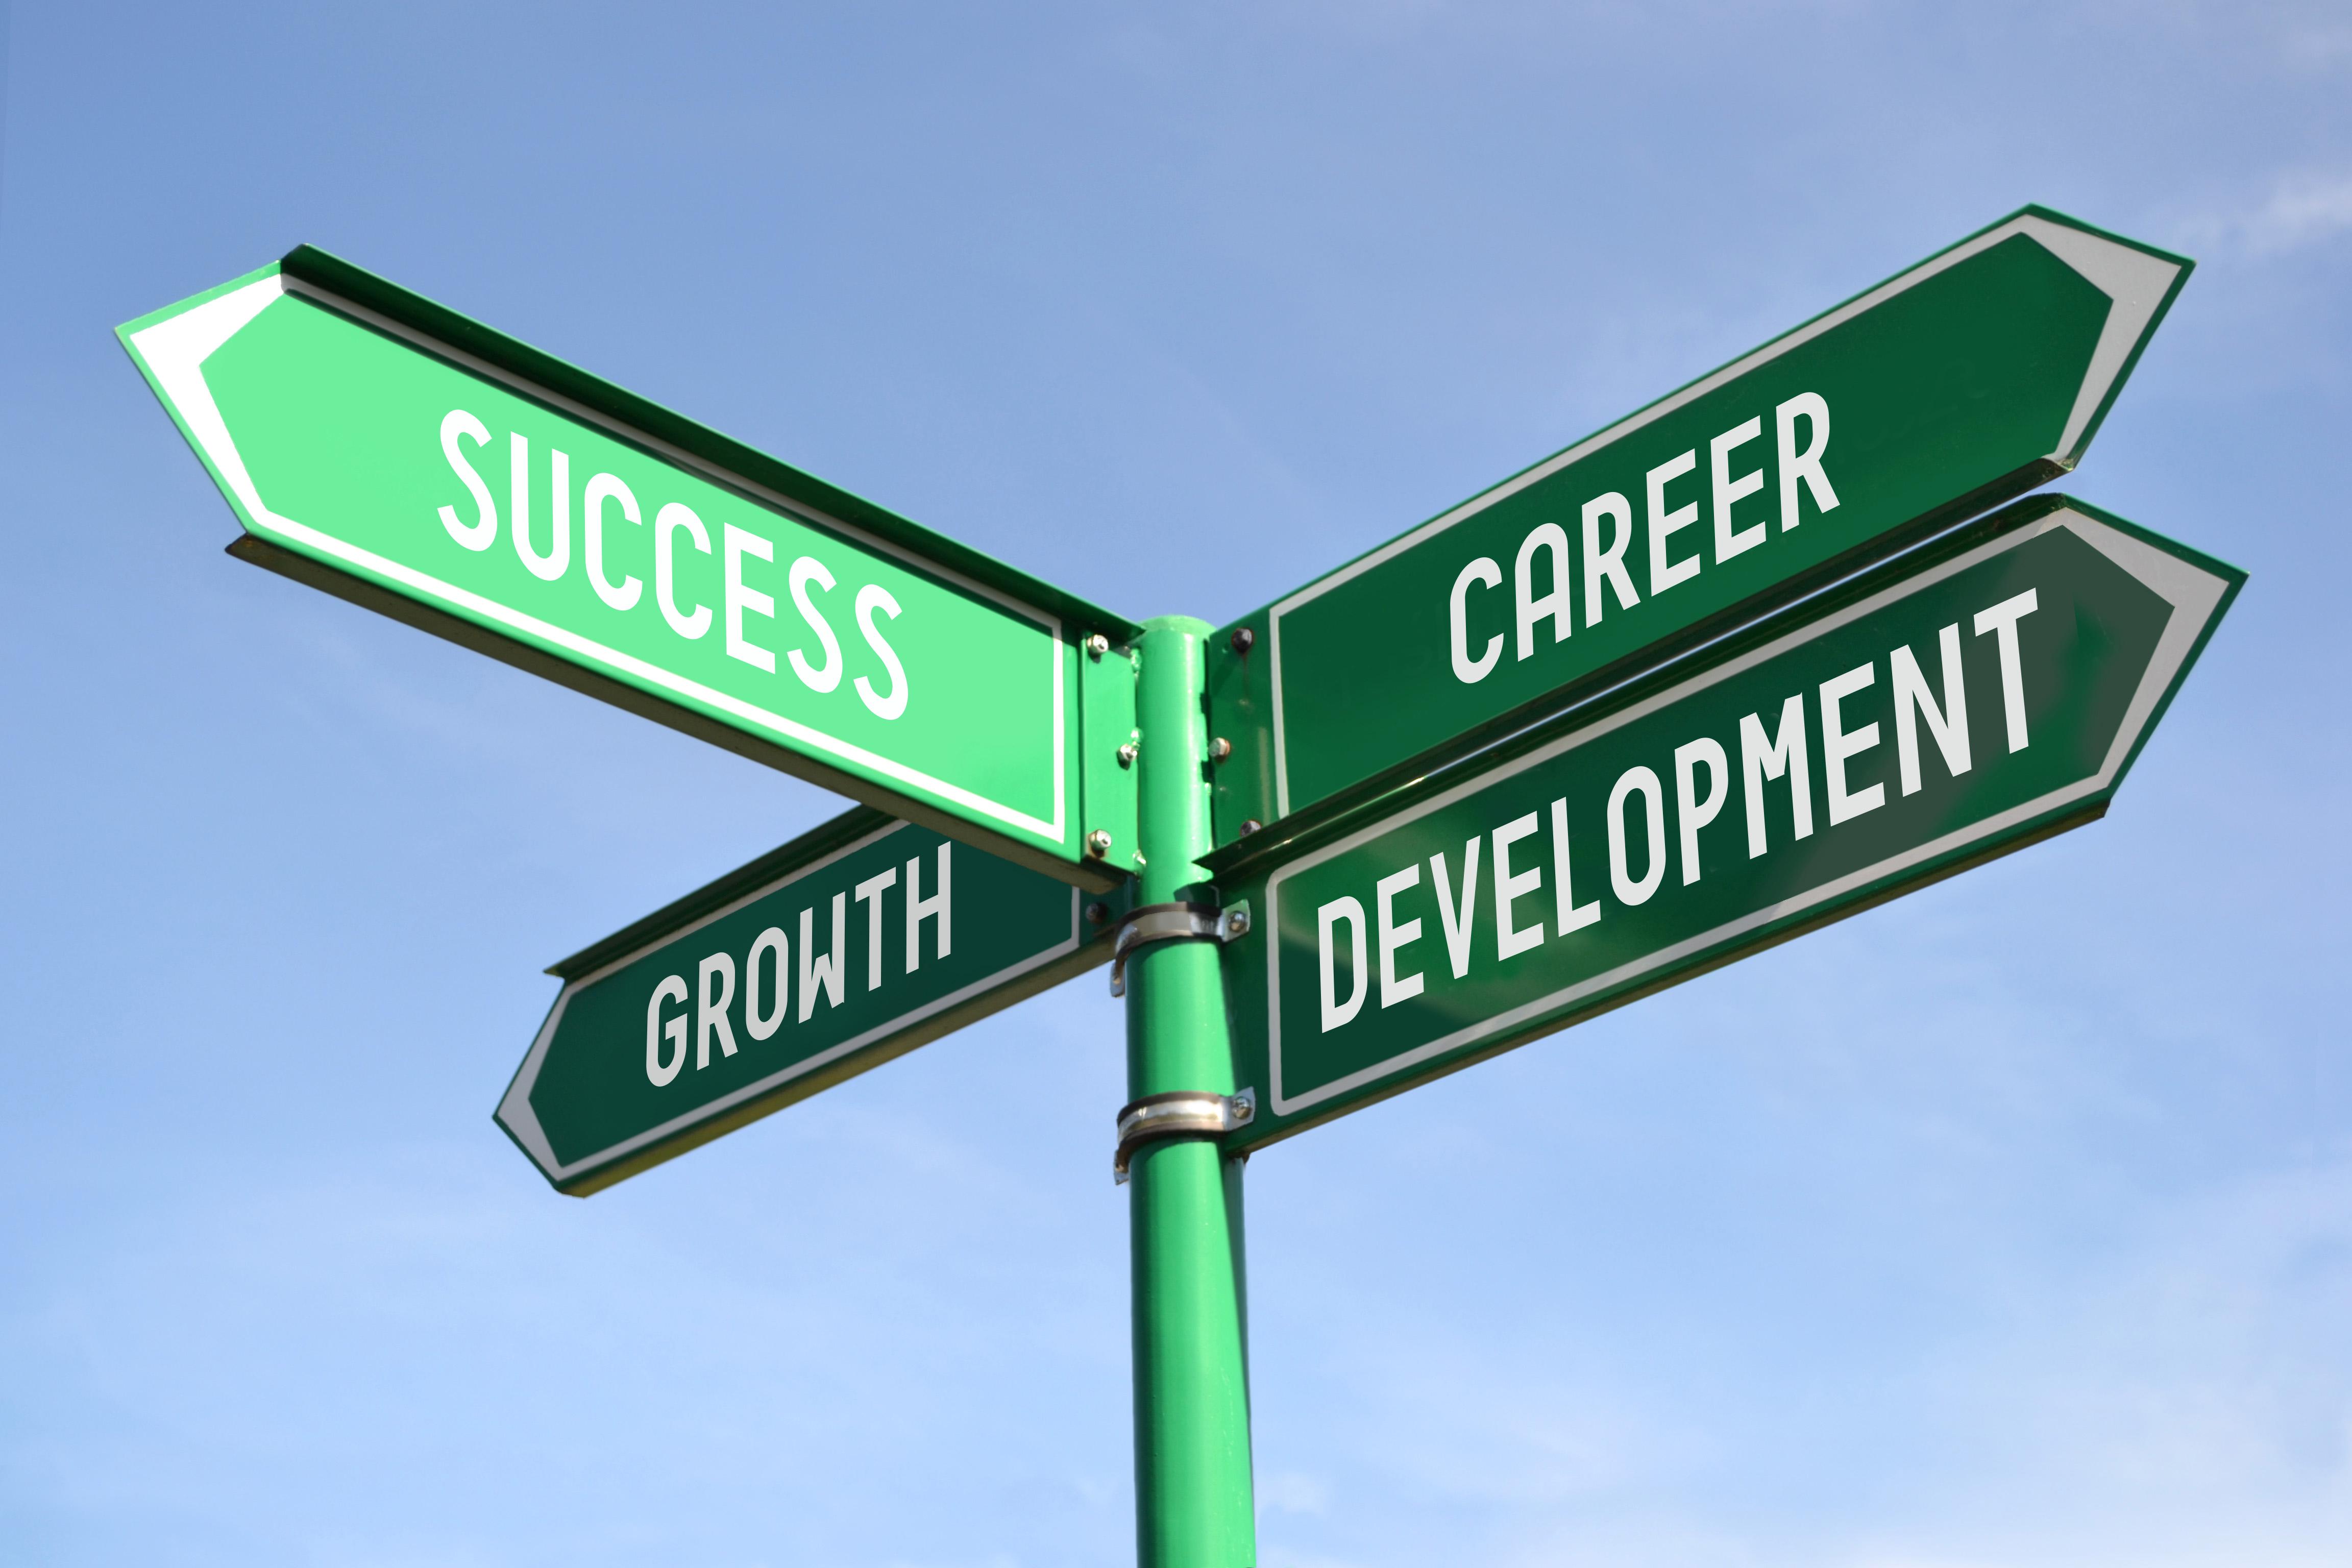 Success, growth, career, development sig